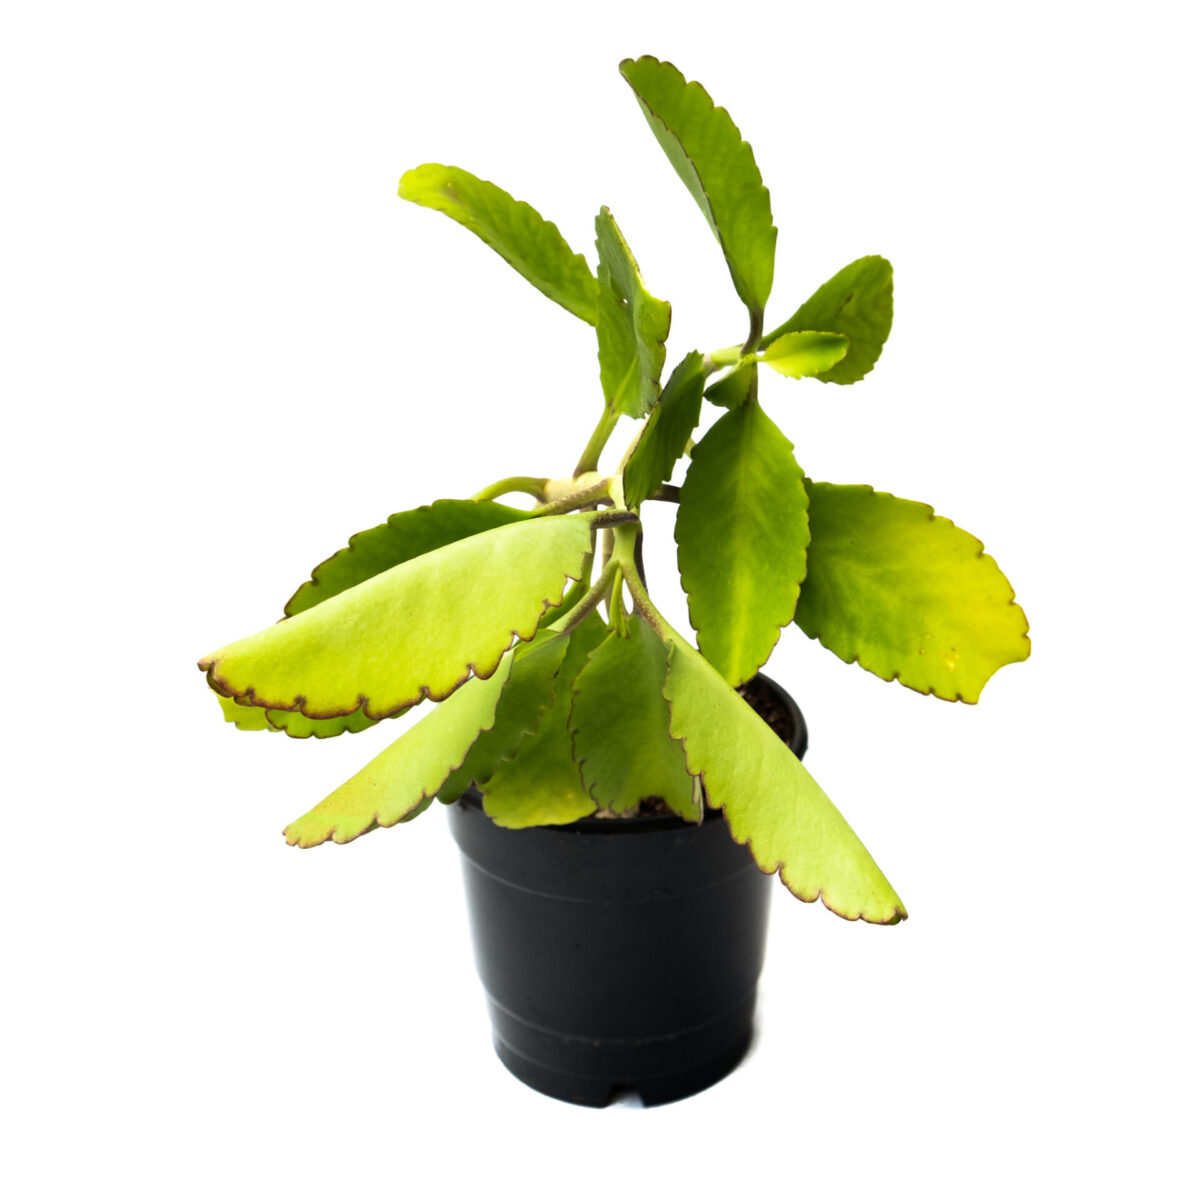 TheBaghStore Bryophyllum Pinnatum